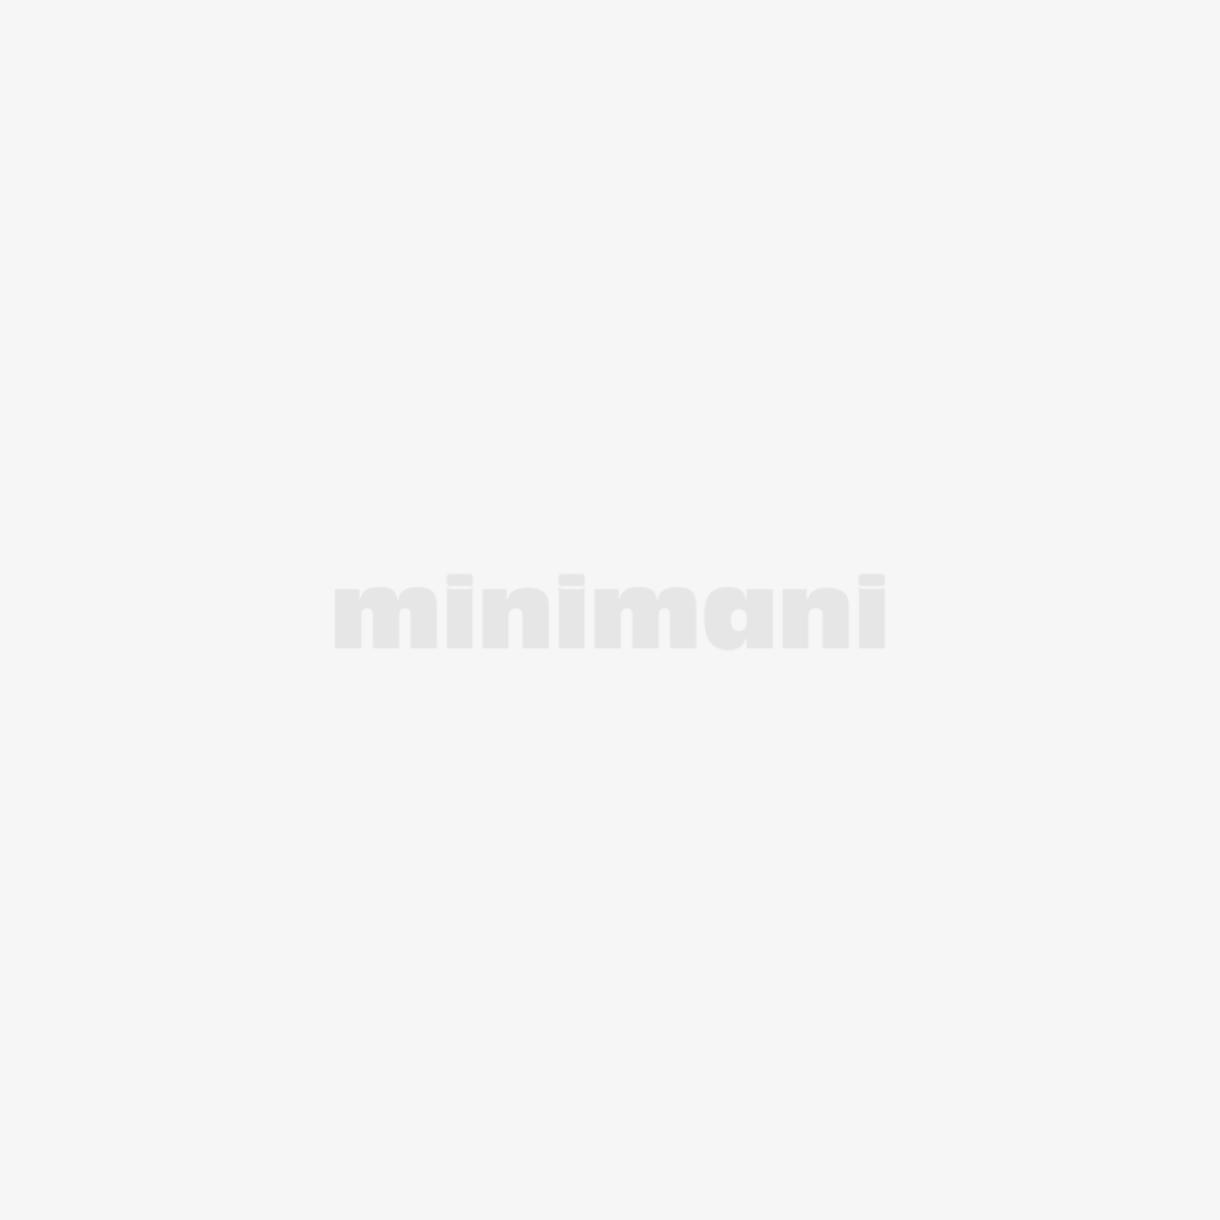 M-FILTER RAITISILMASUODATIN MACA 8015 C70,S60,S70,S80,V70 AKTII